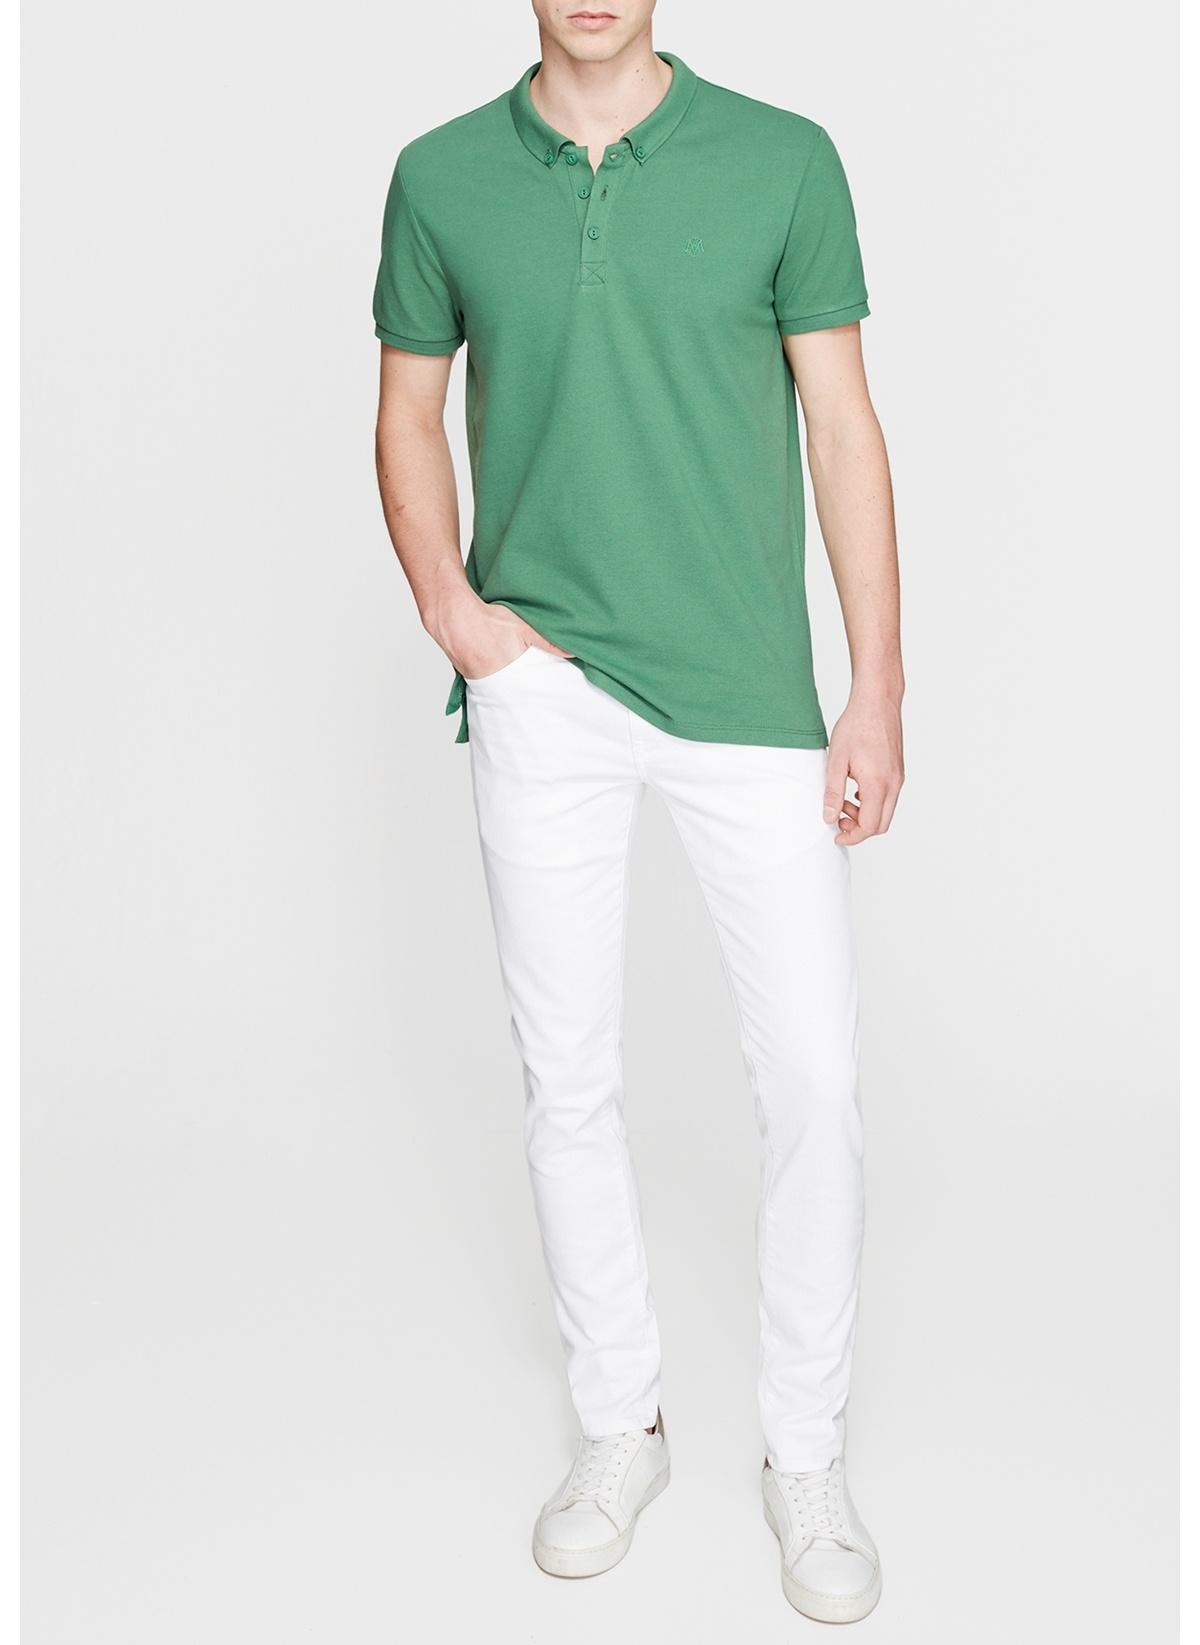 Mavi Jean Pantolon  |James - Super Skinny